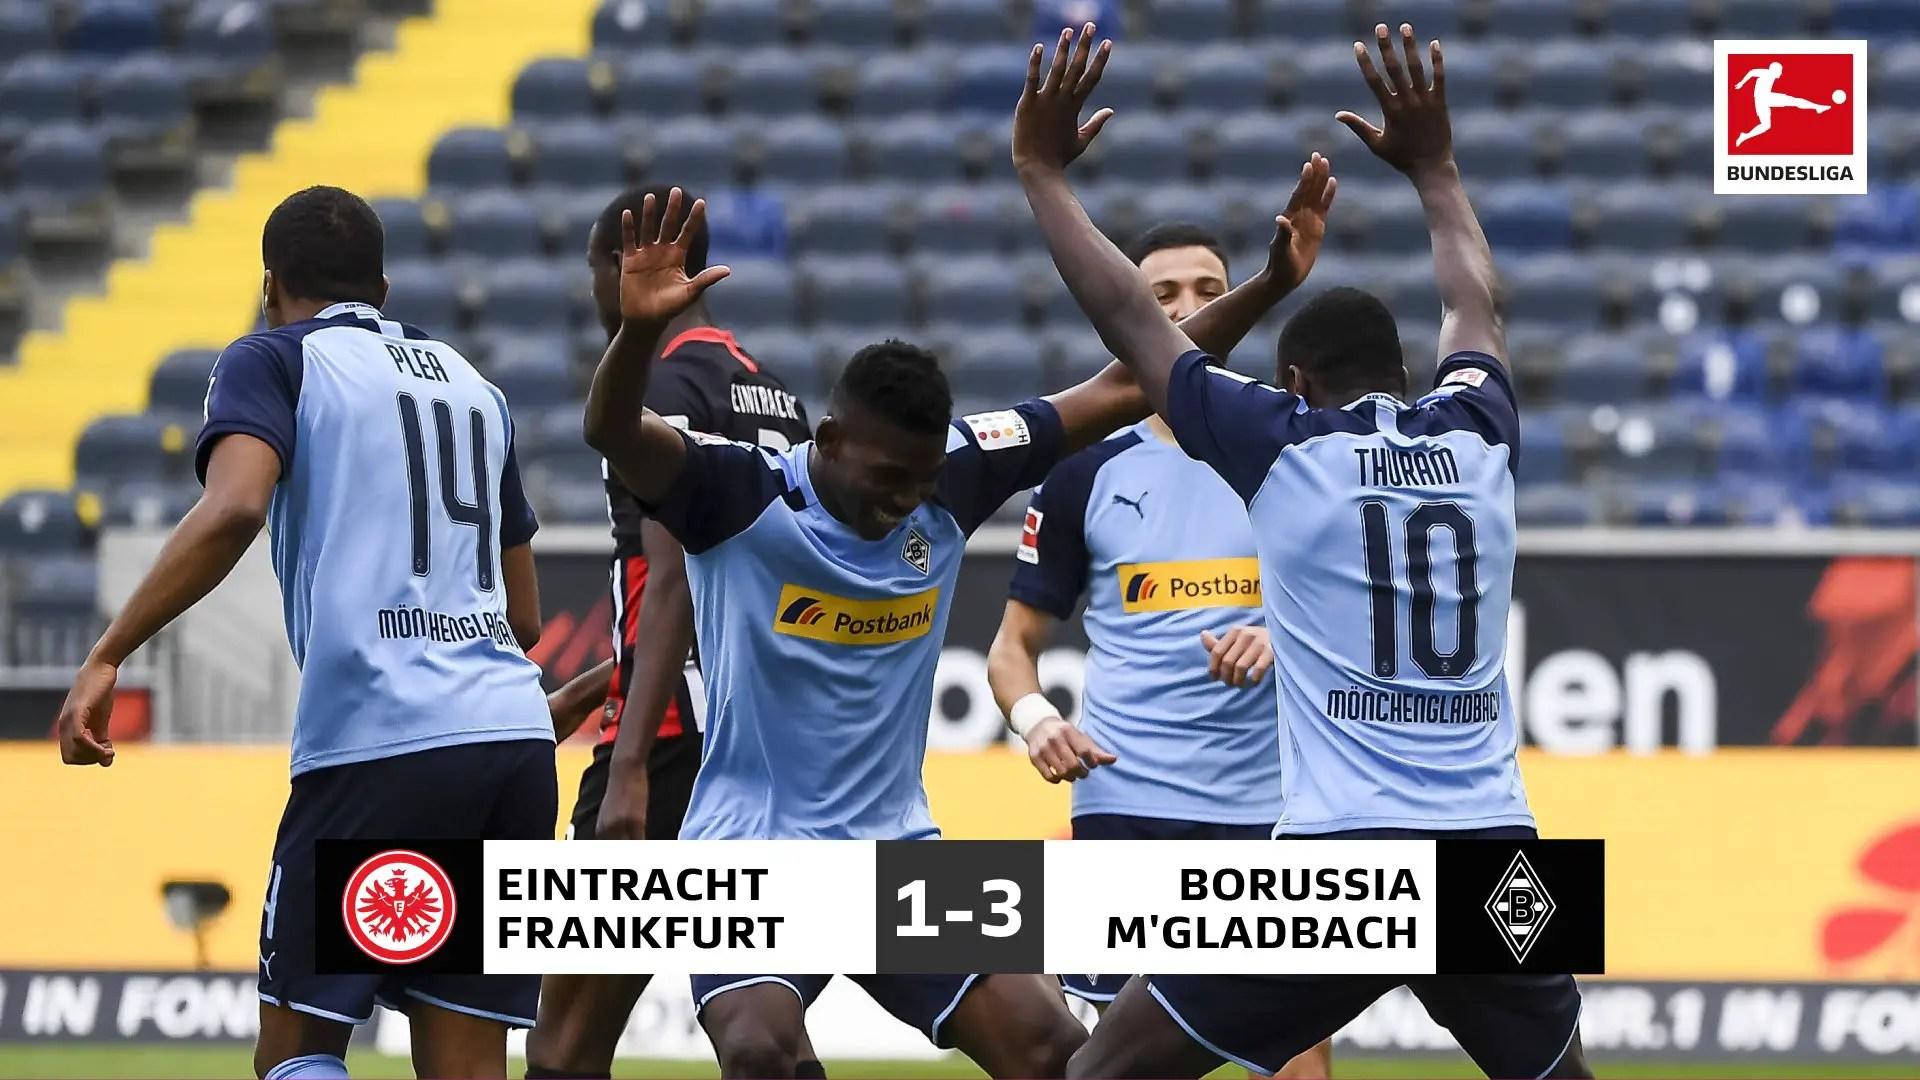 Bundesliga:  M'gladbach Climb To Third Spot With Away Win At Frankfurt